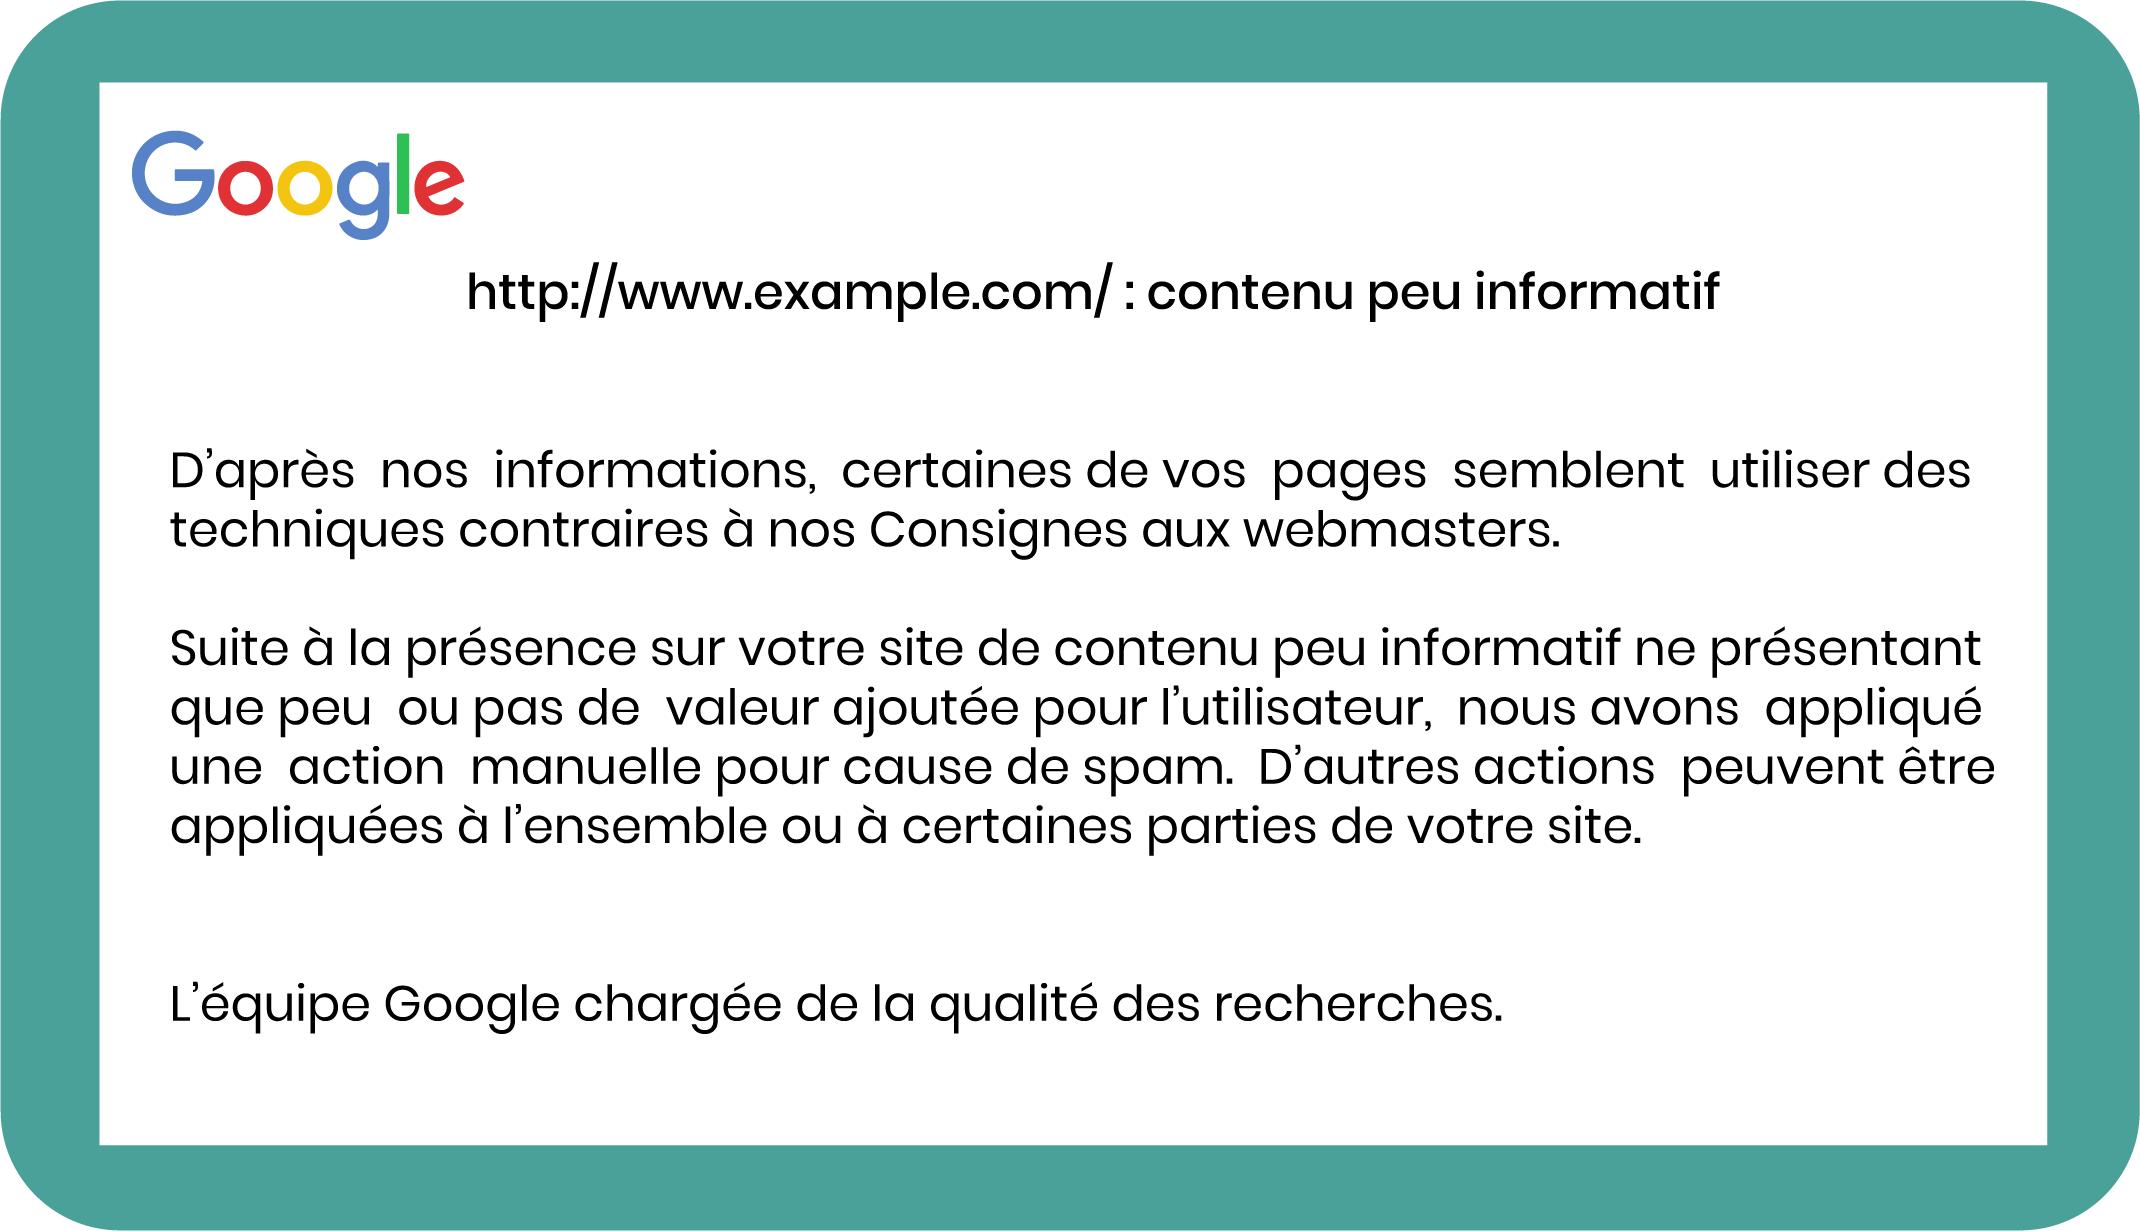 Exemple d'avertissement Google concernant un contenu peu informatif sur un site